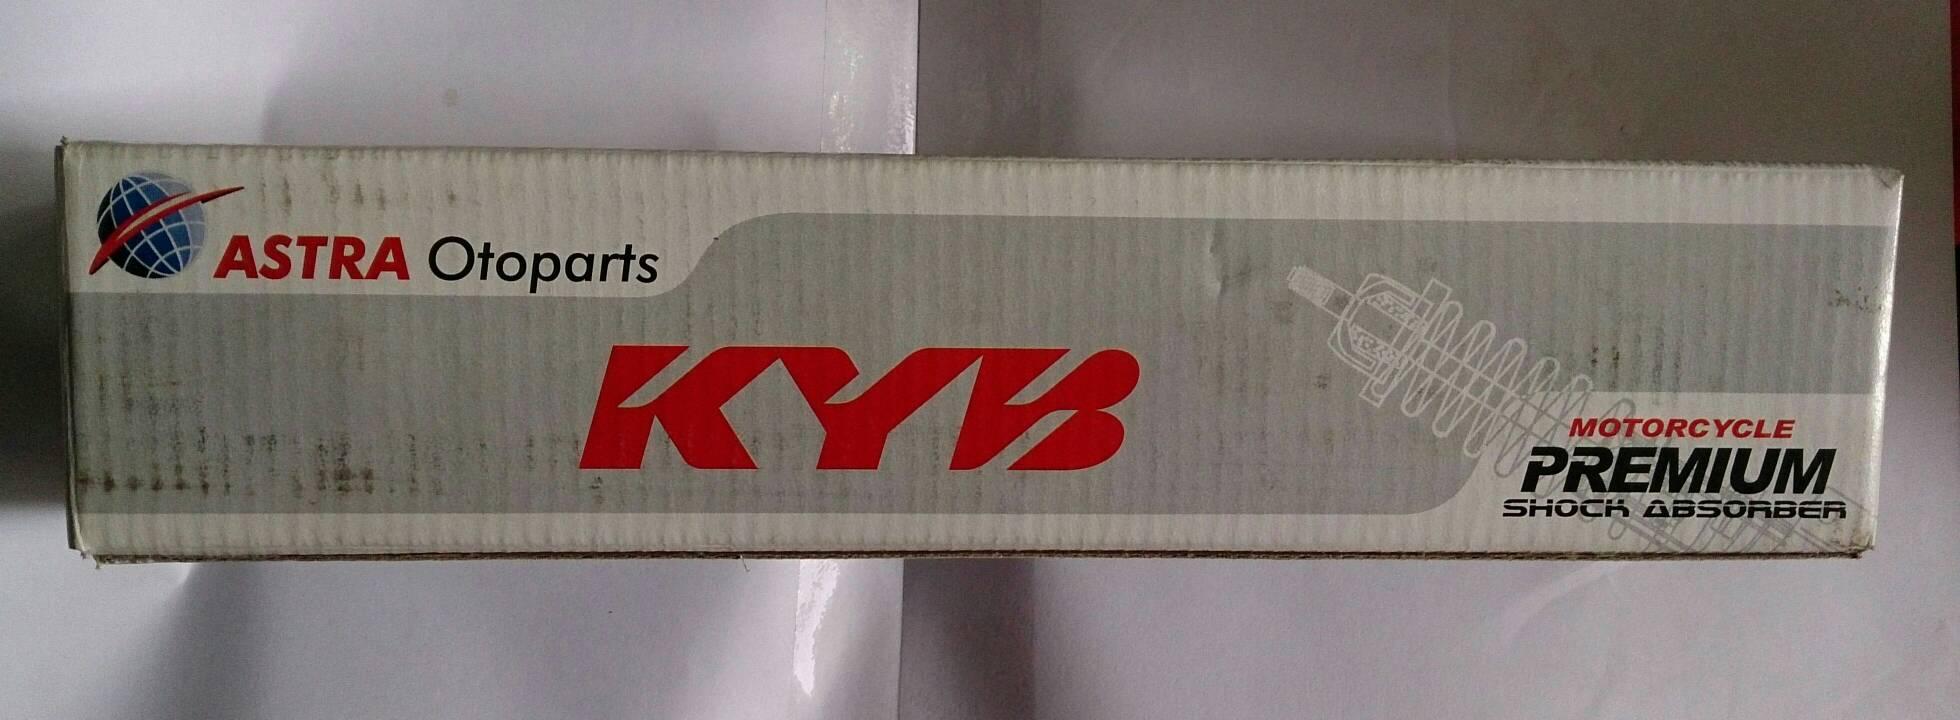 harga shock breaker belakang vespa super px ps sprint Kayaba Tokopedia.com